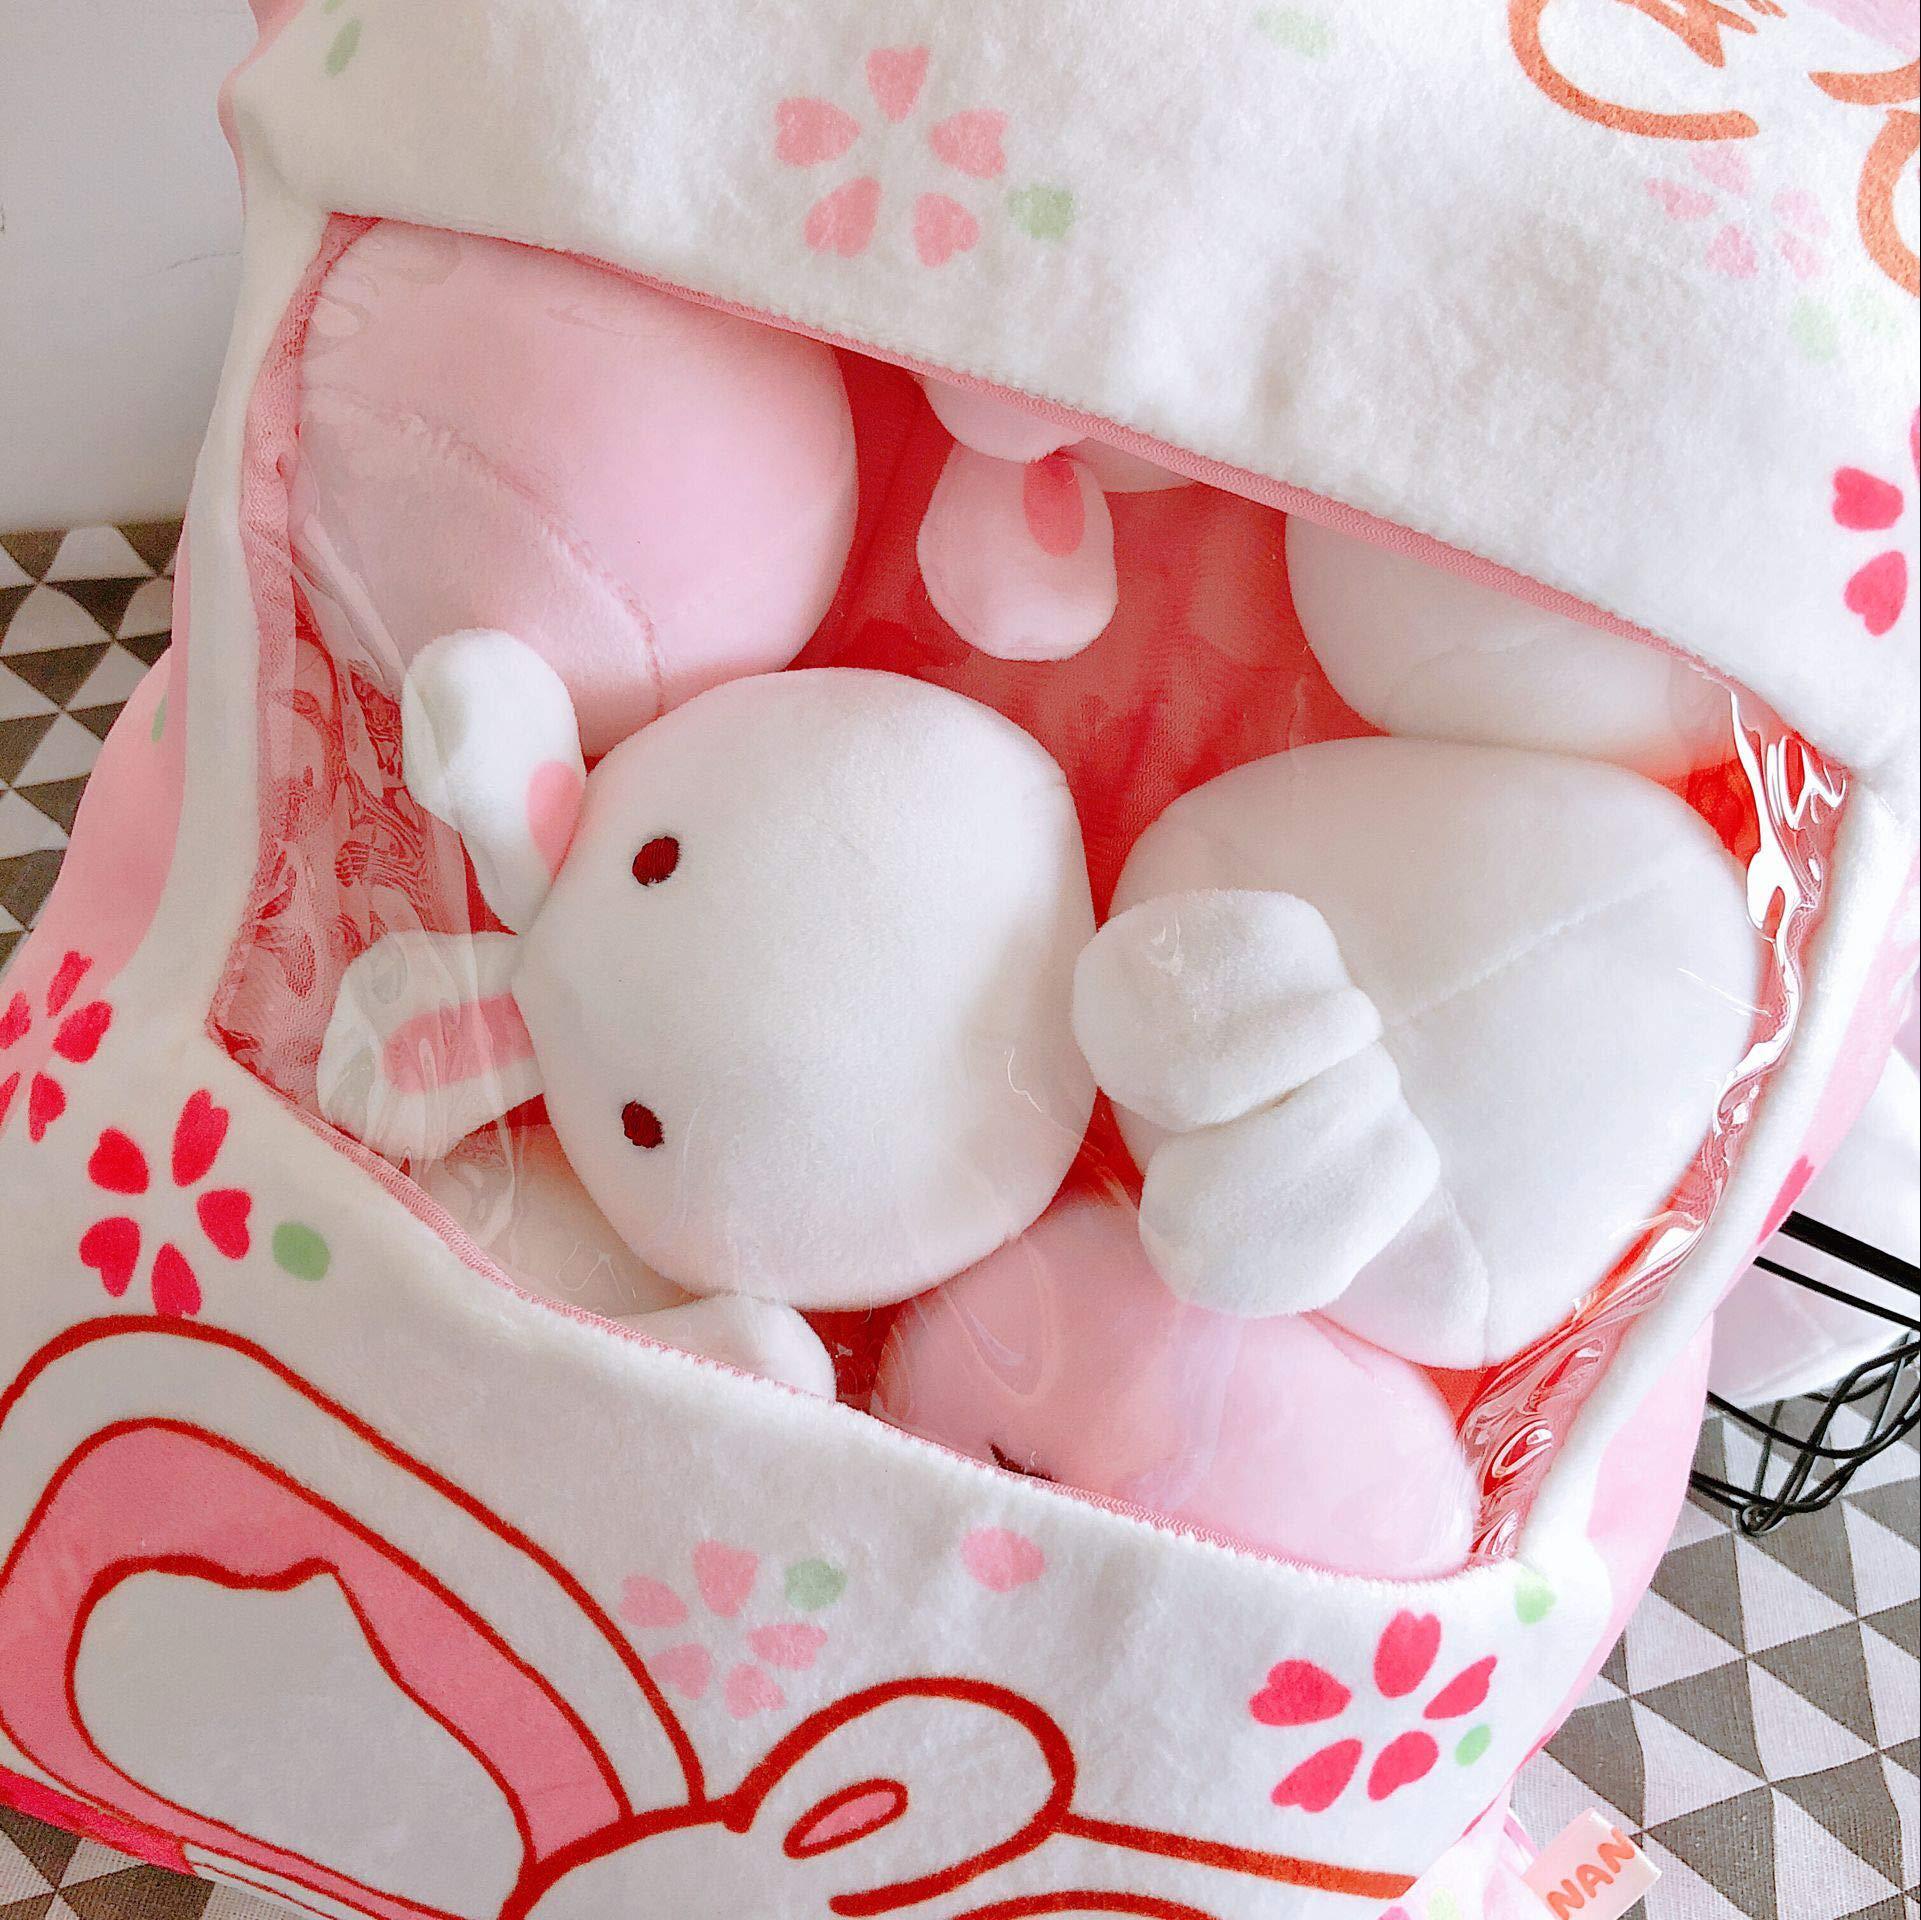 Nenalayo Cute Throw Pillow Stuffed Animal Toys Removable Fluffy Bunnies Creative Gifts for Teens Girls Kids by Nenalayo (Image #4)